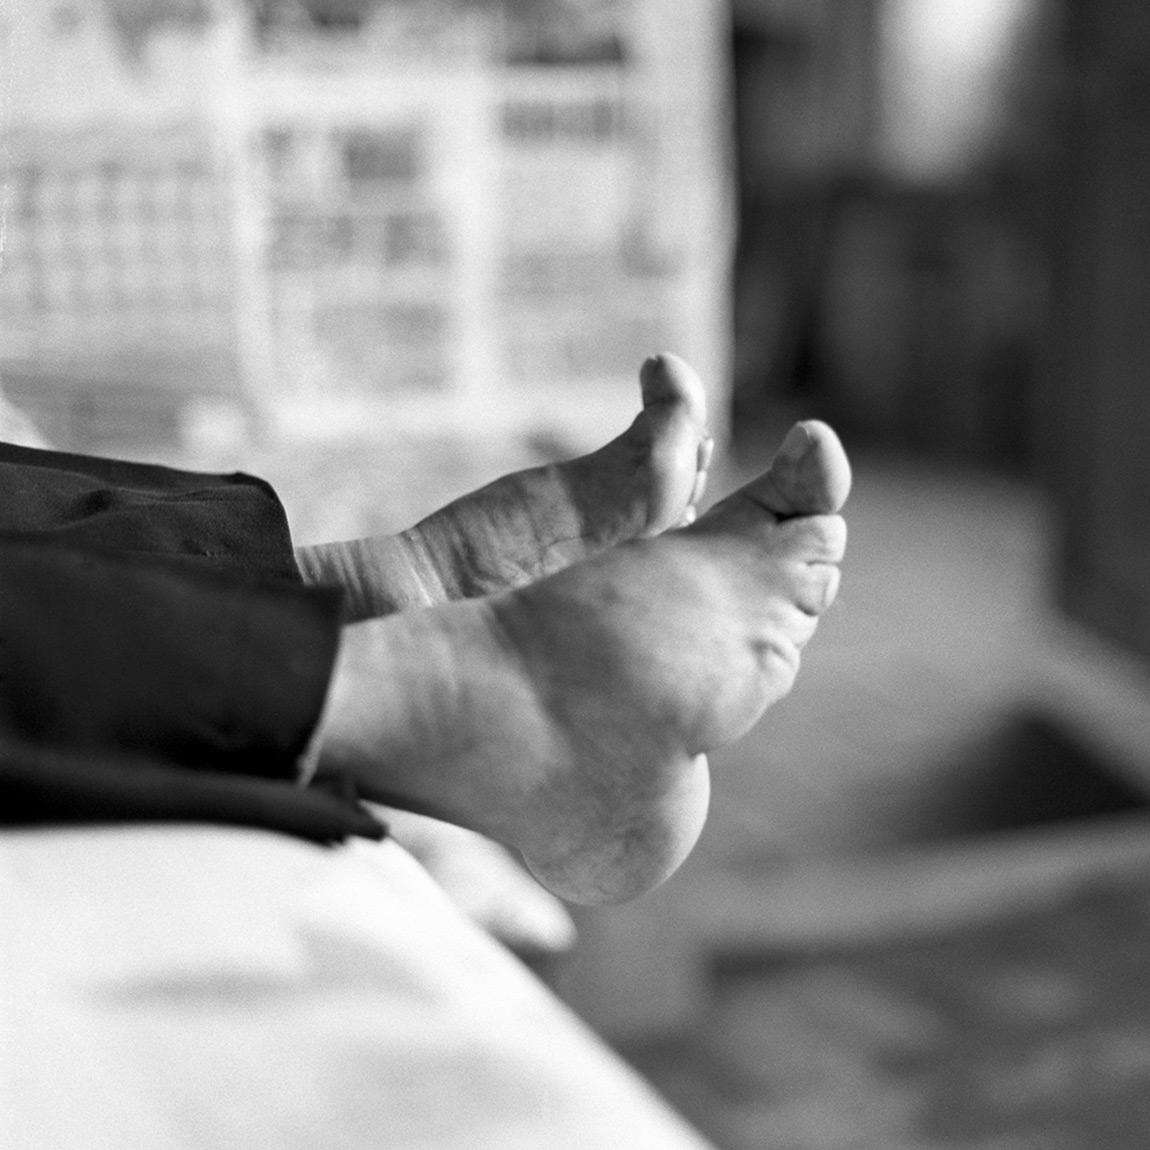 China Photo Story: The Last Survivors Of Crippling Foot